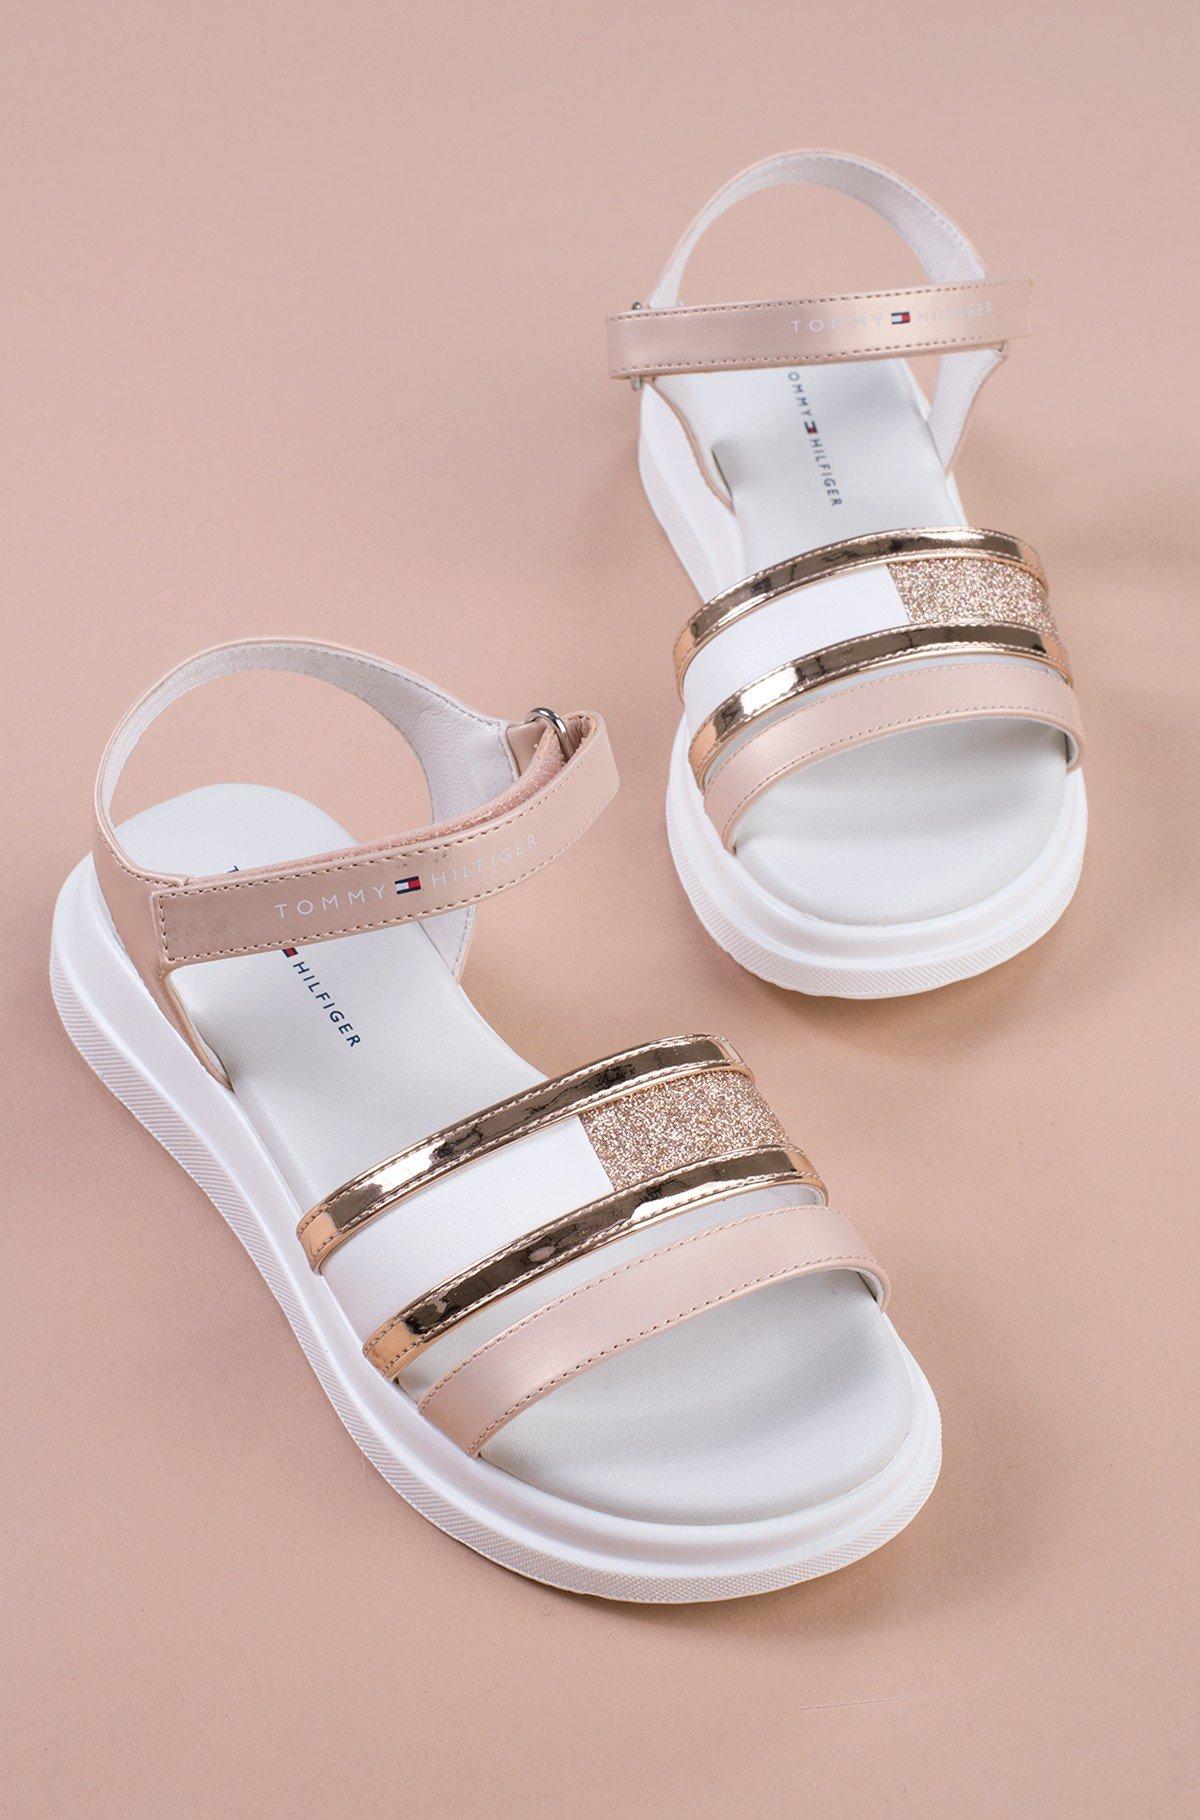 Sandals T3A2-31038-1160341-full-2